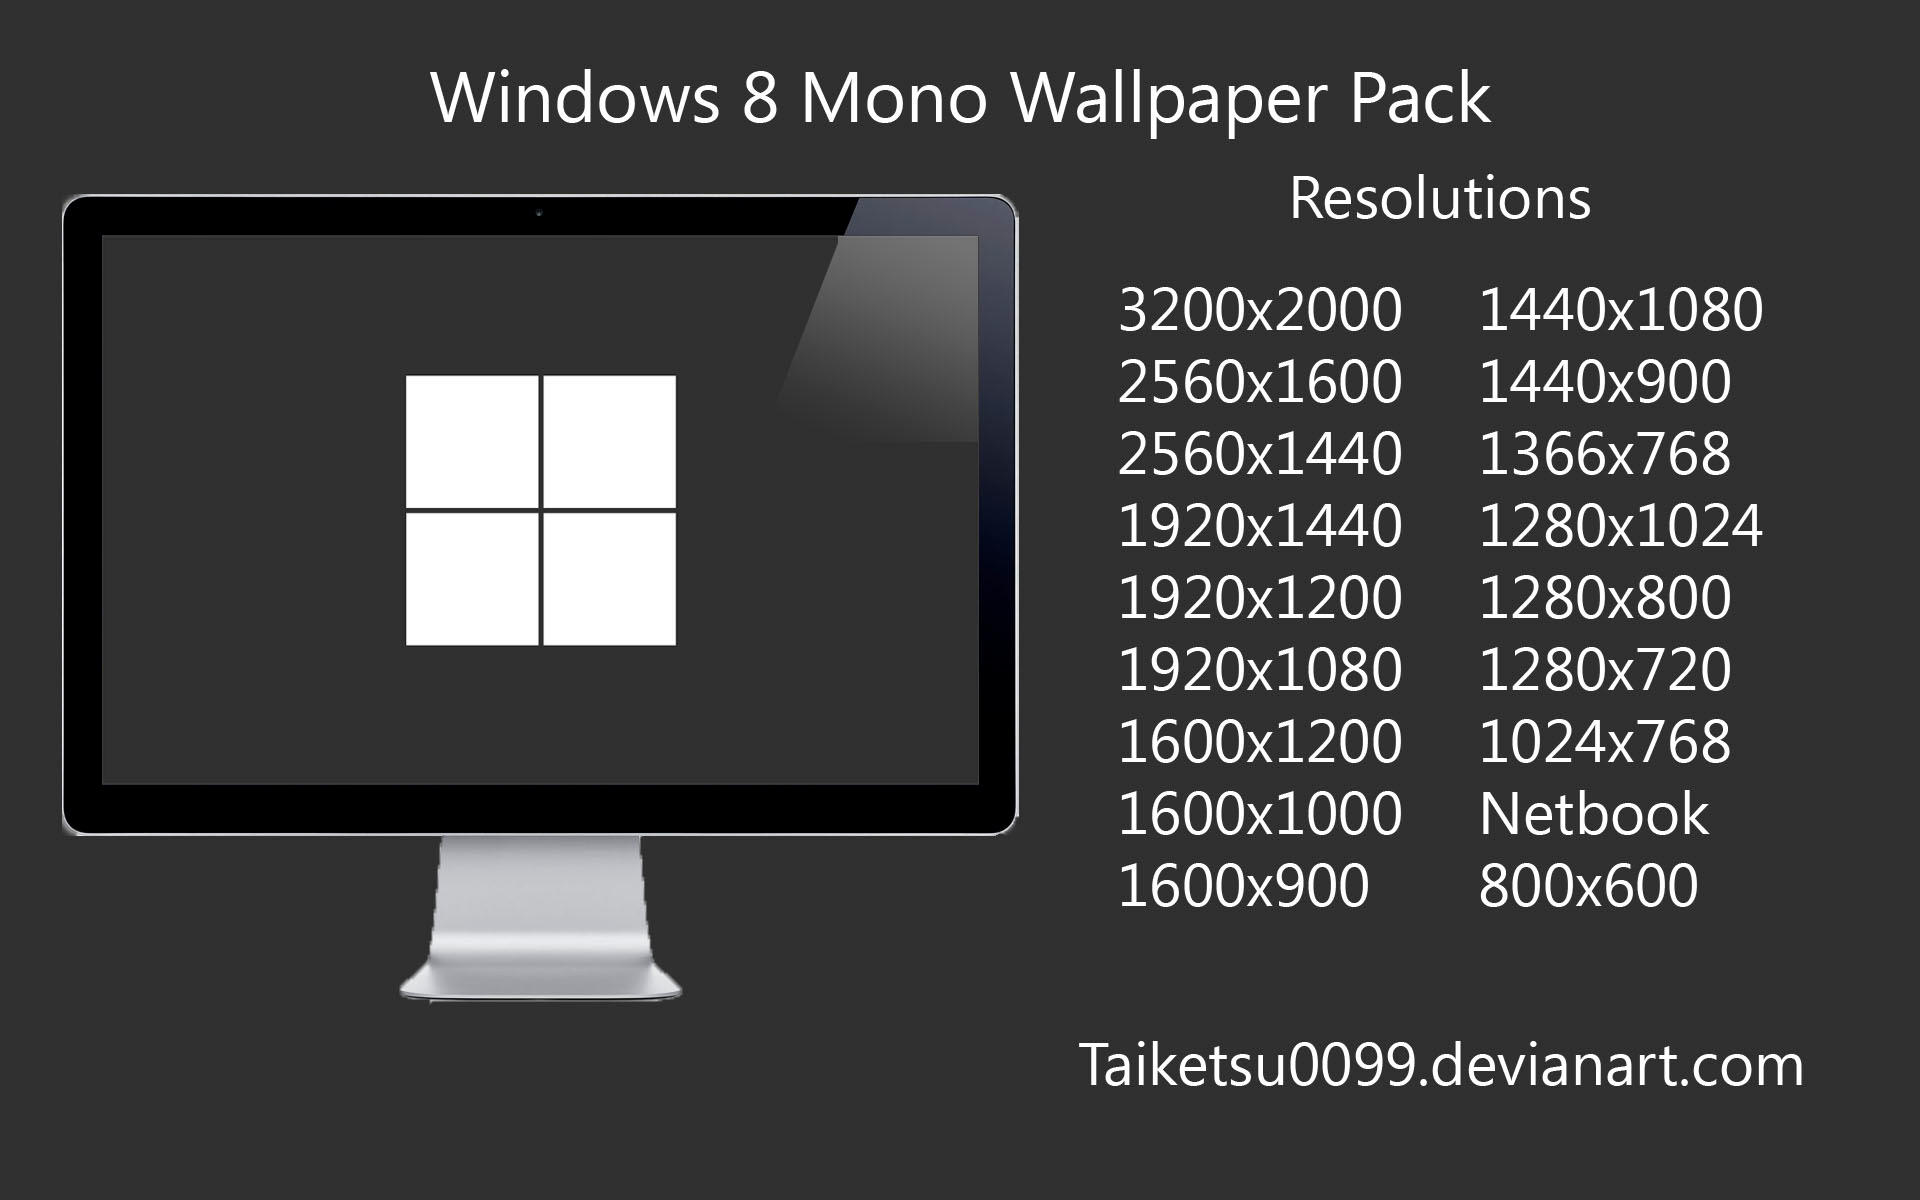 Windows 8 Mono Wallpaper Pack by Taiketsu0099 by Taiketsu0099